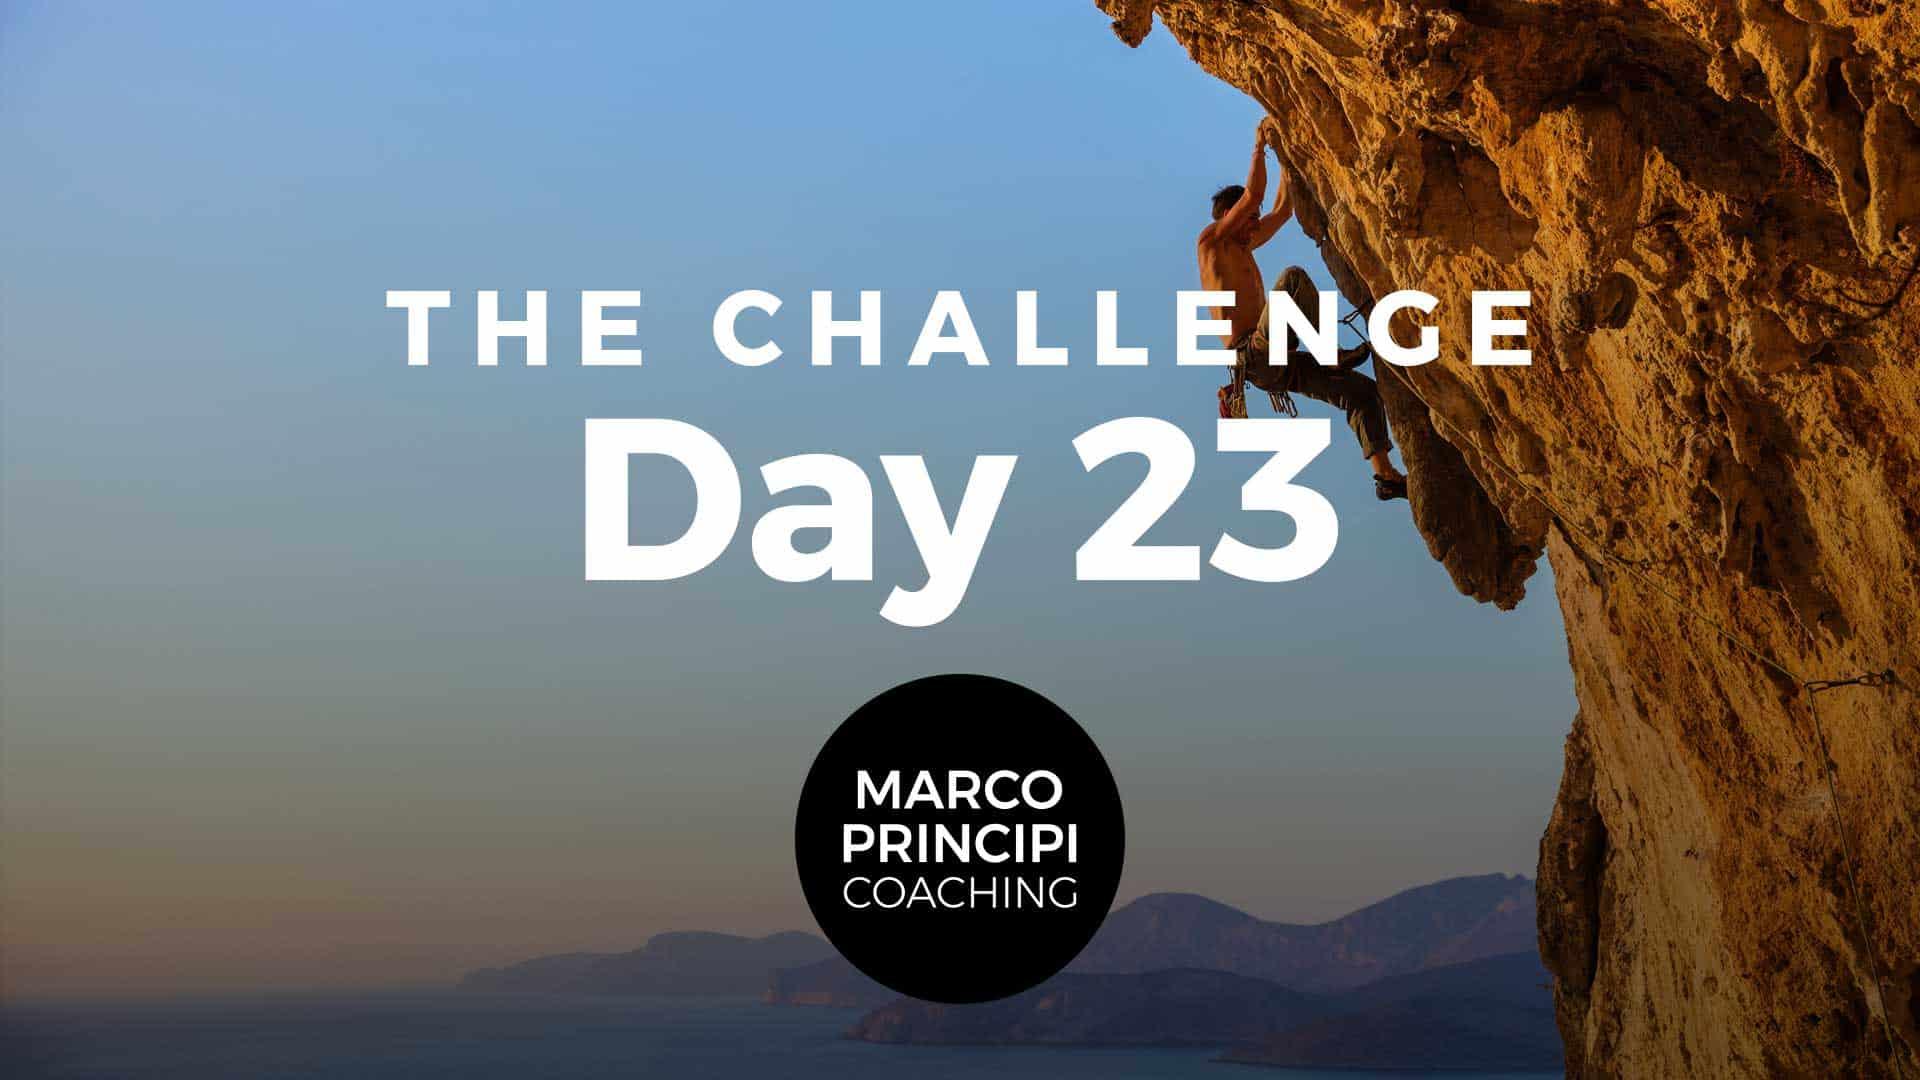 Marco Principi The Challenge Day 023